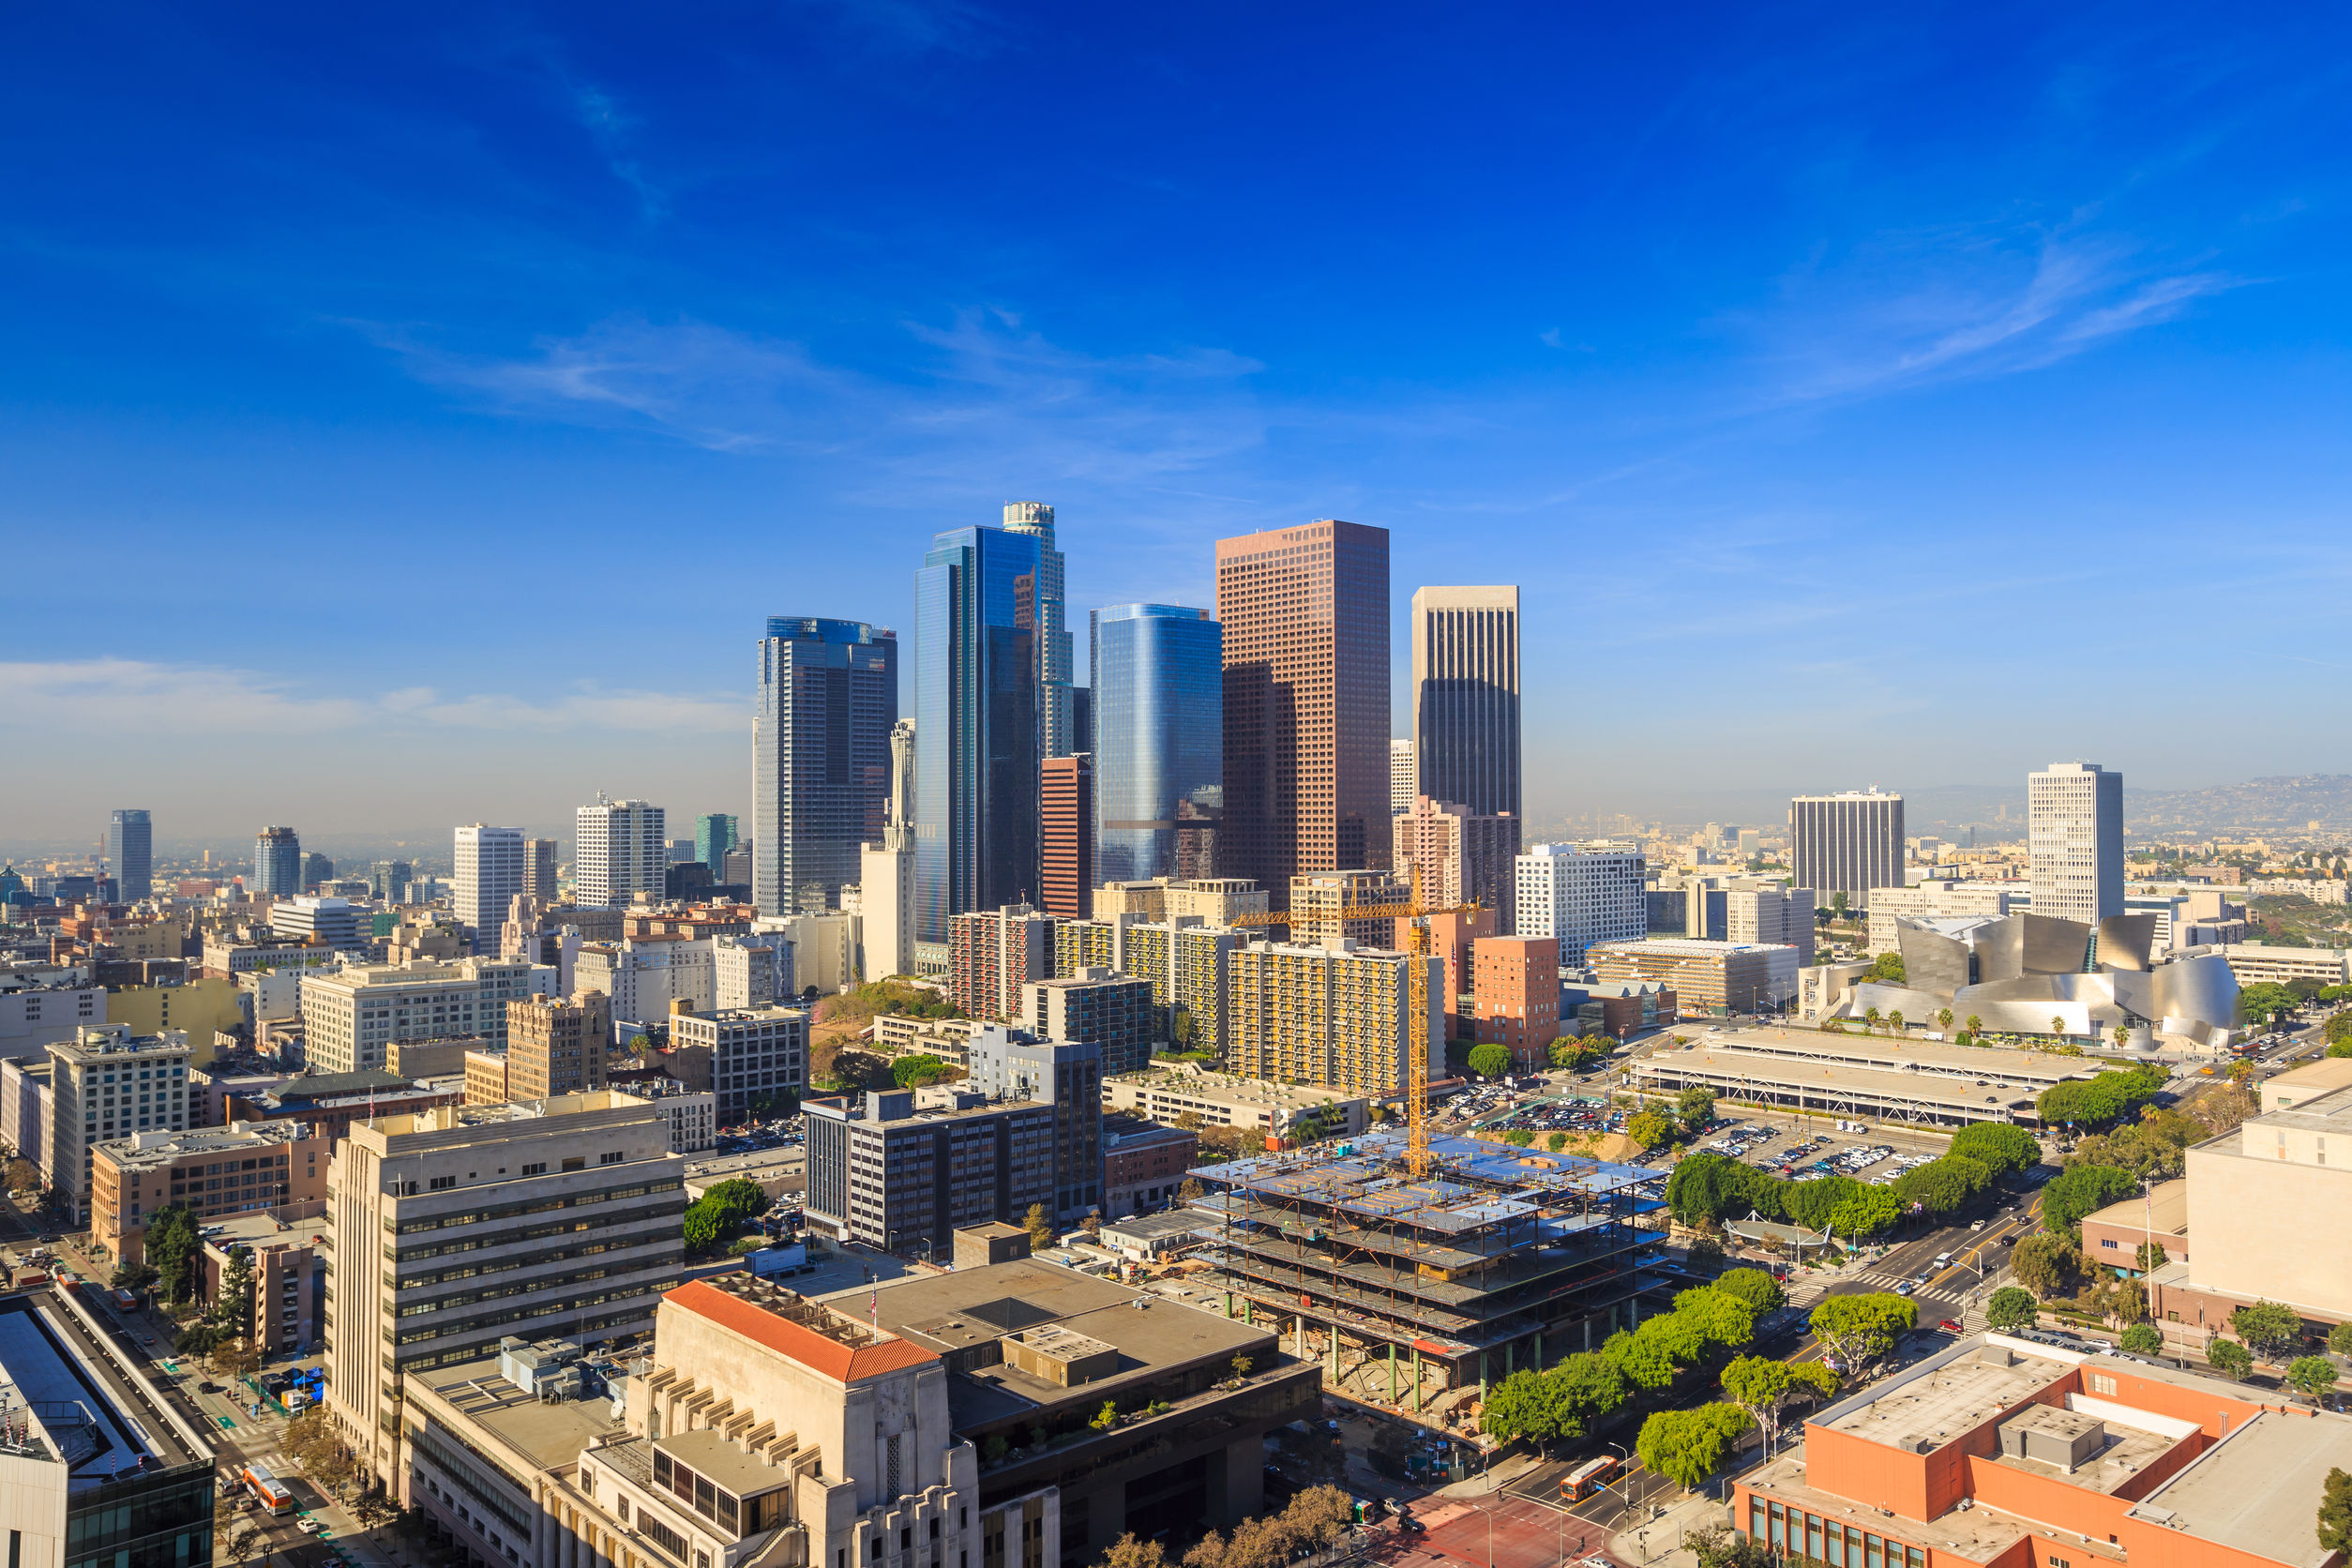 Los Angeles Cruise Ship Injury Lawyer